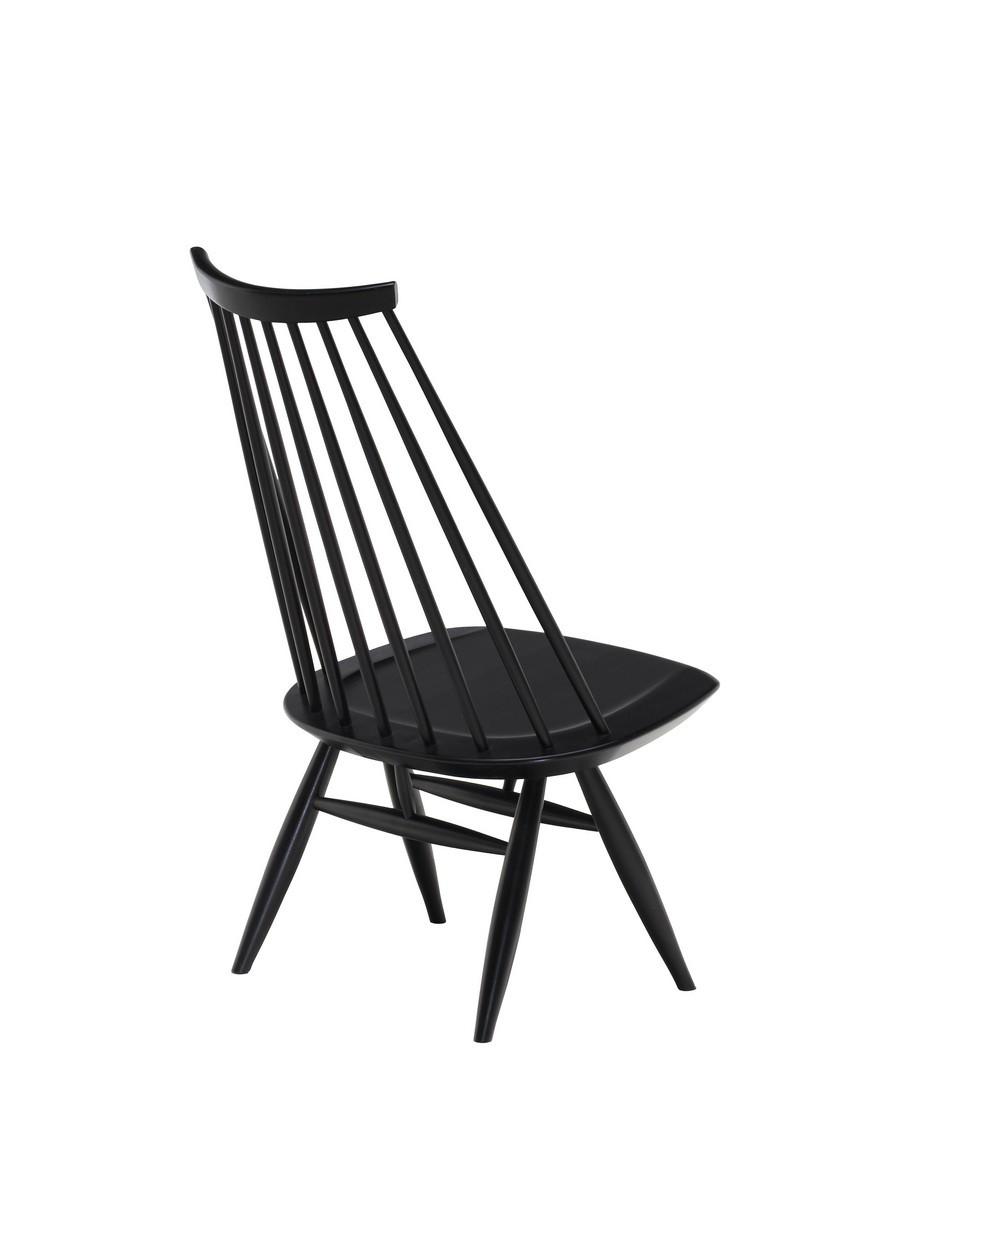 Mademoiselle Chair, Ilmari Tapiovaara design for Artek